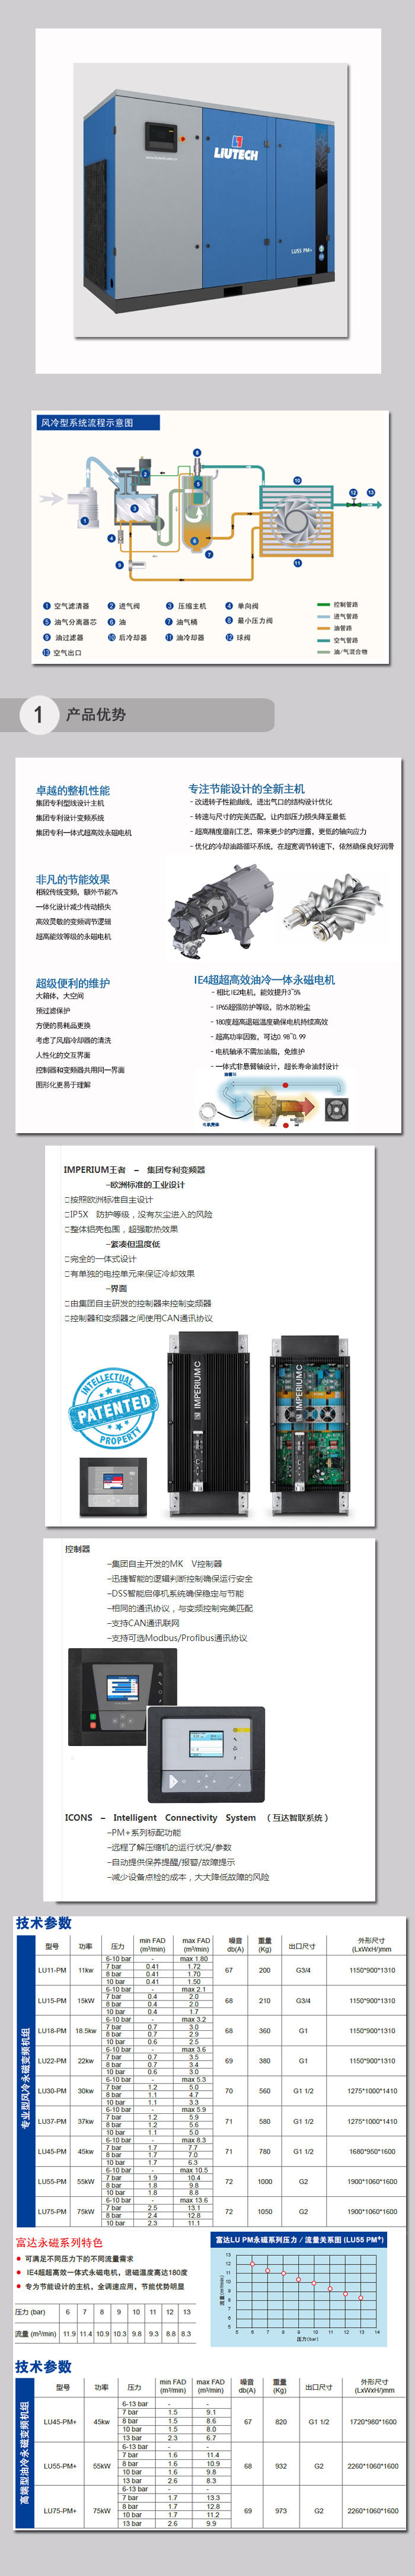 LU11-75PM+超高效油冷永磁變頻.jpg